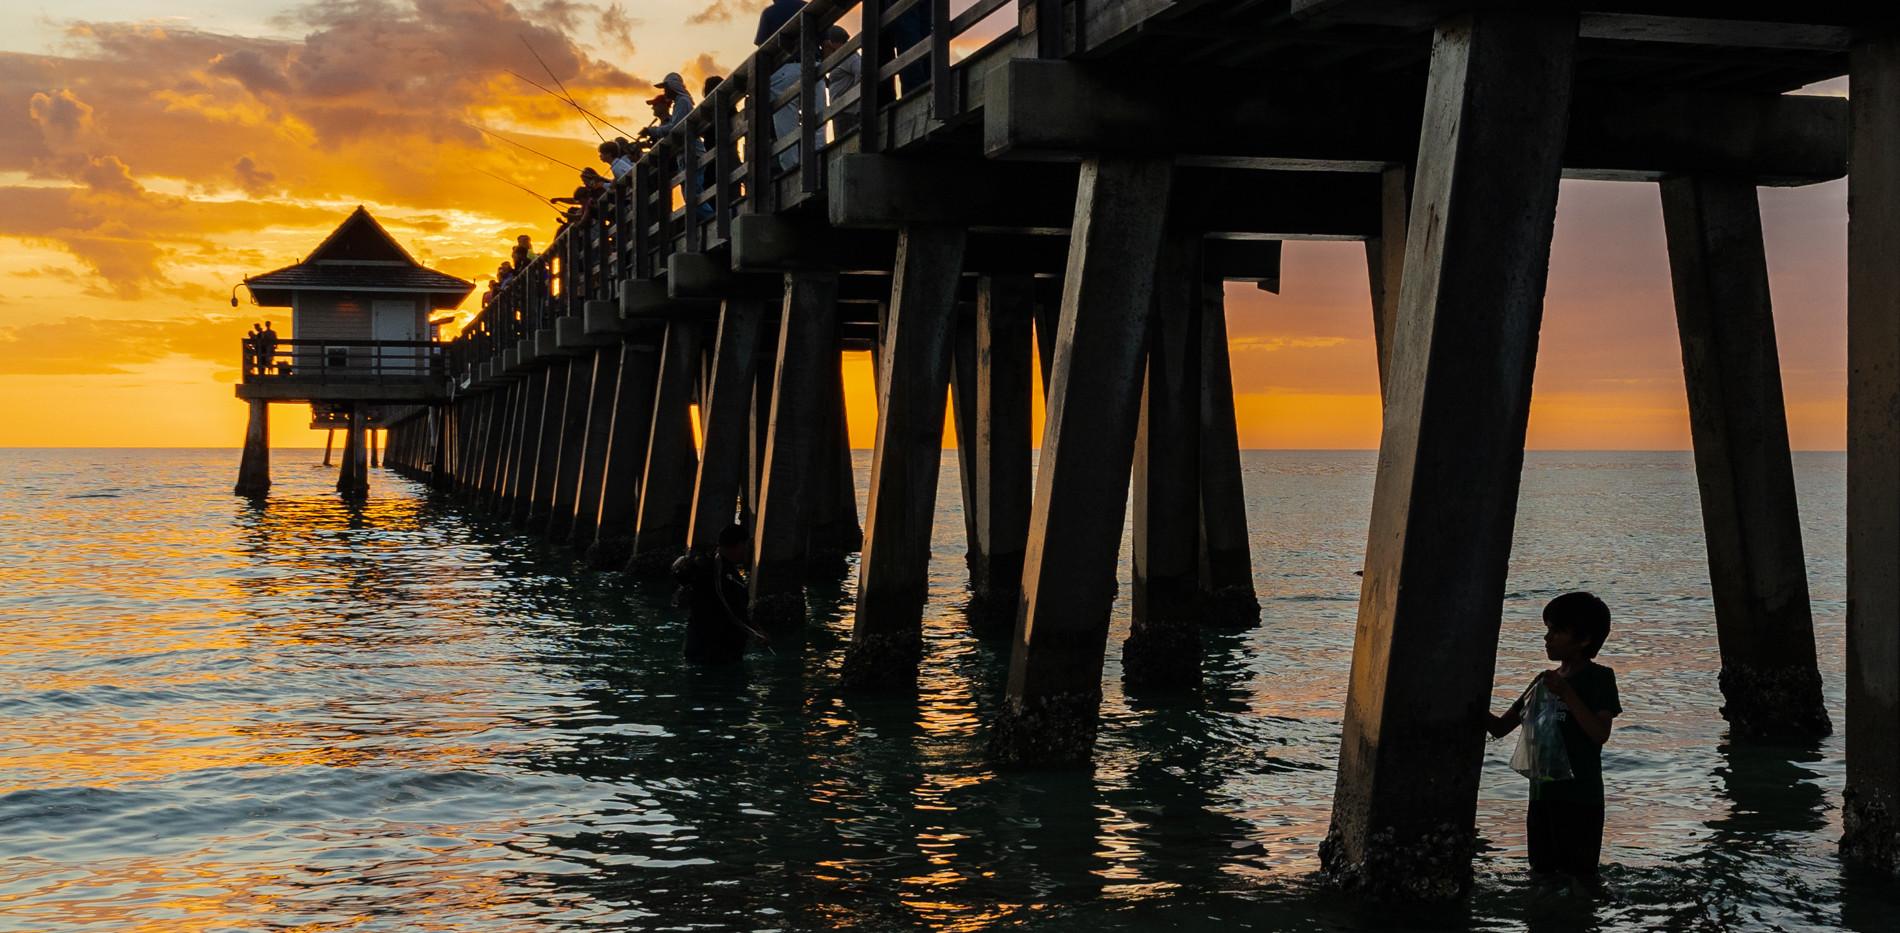 3rd: Under the Pier